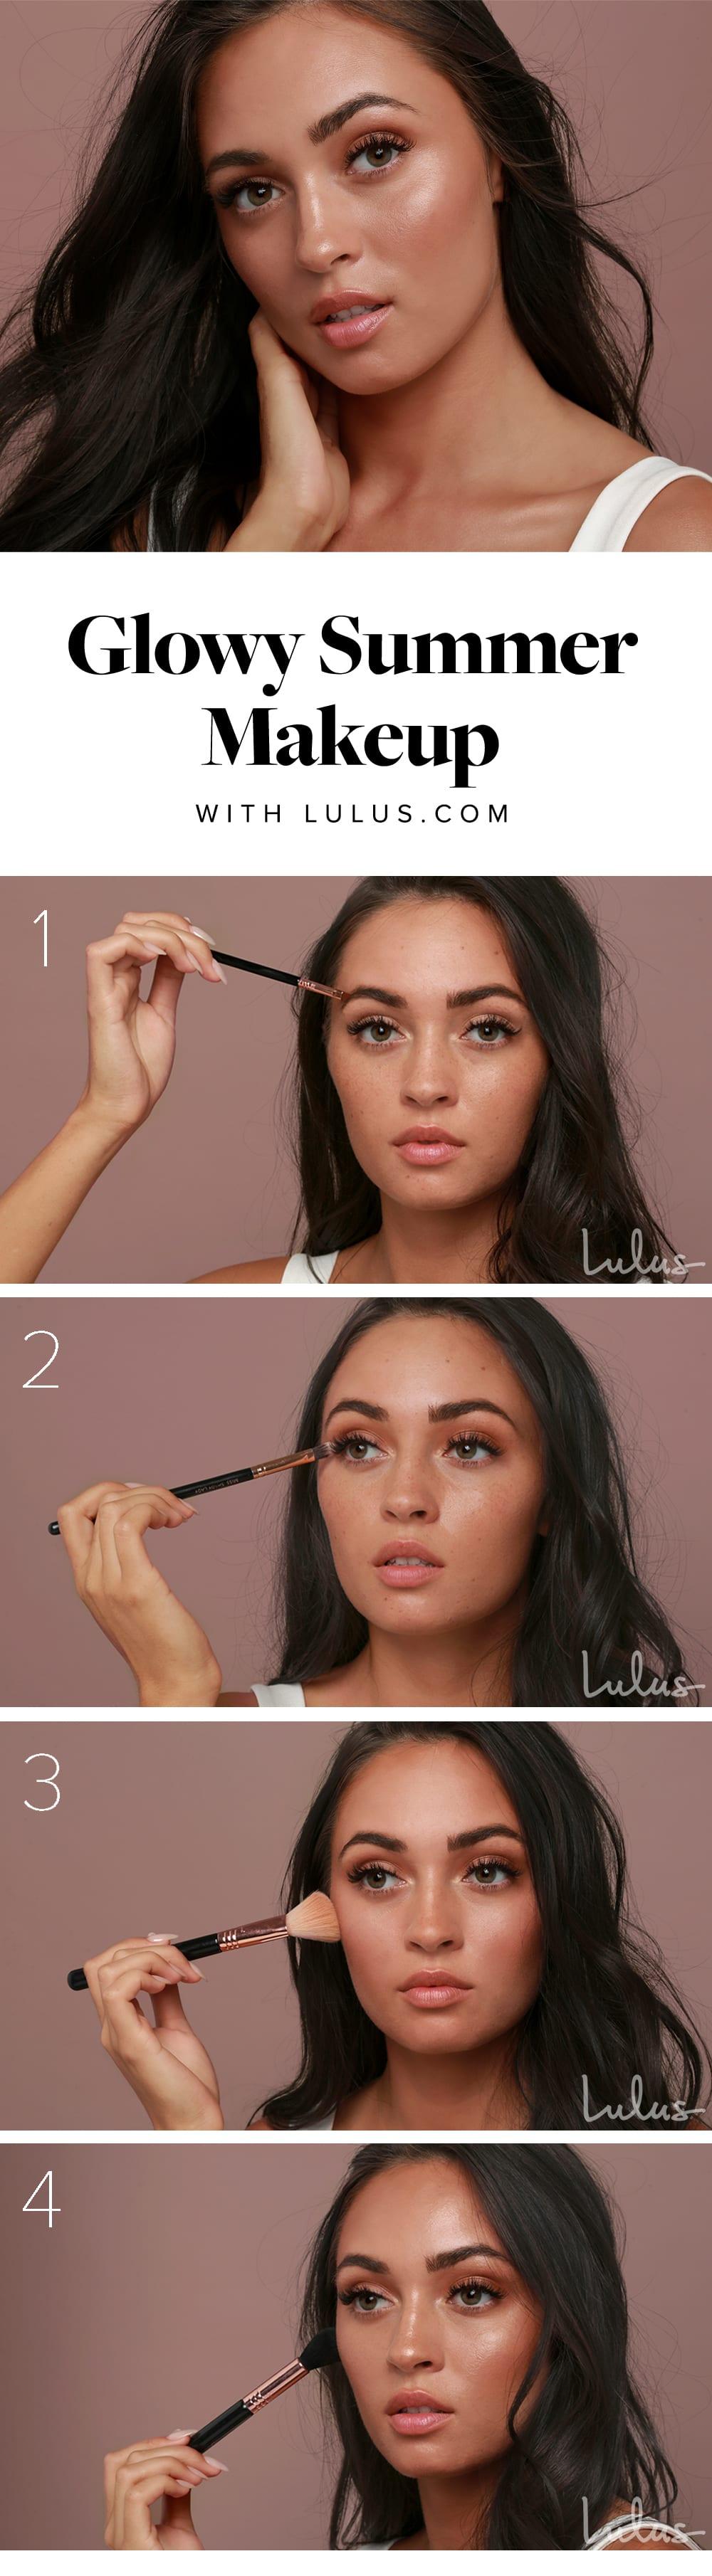 glowy summer makeup tutorial - header image